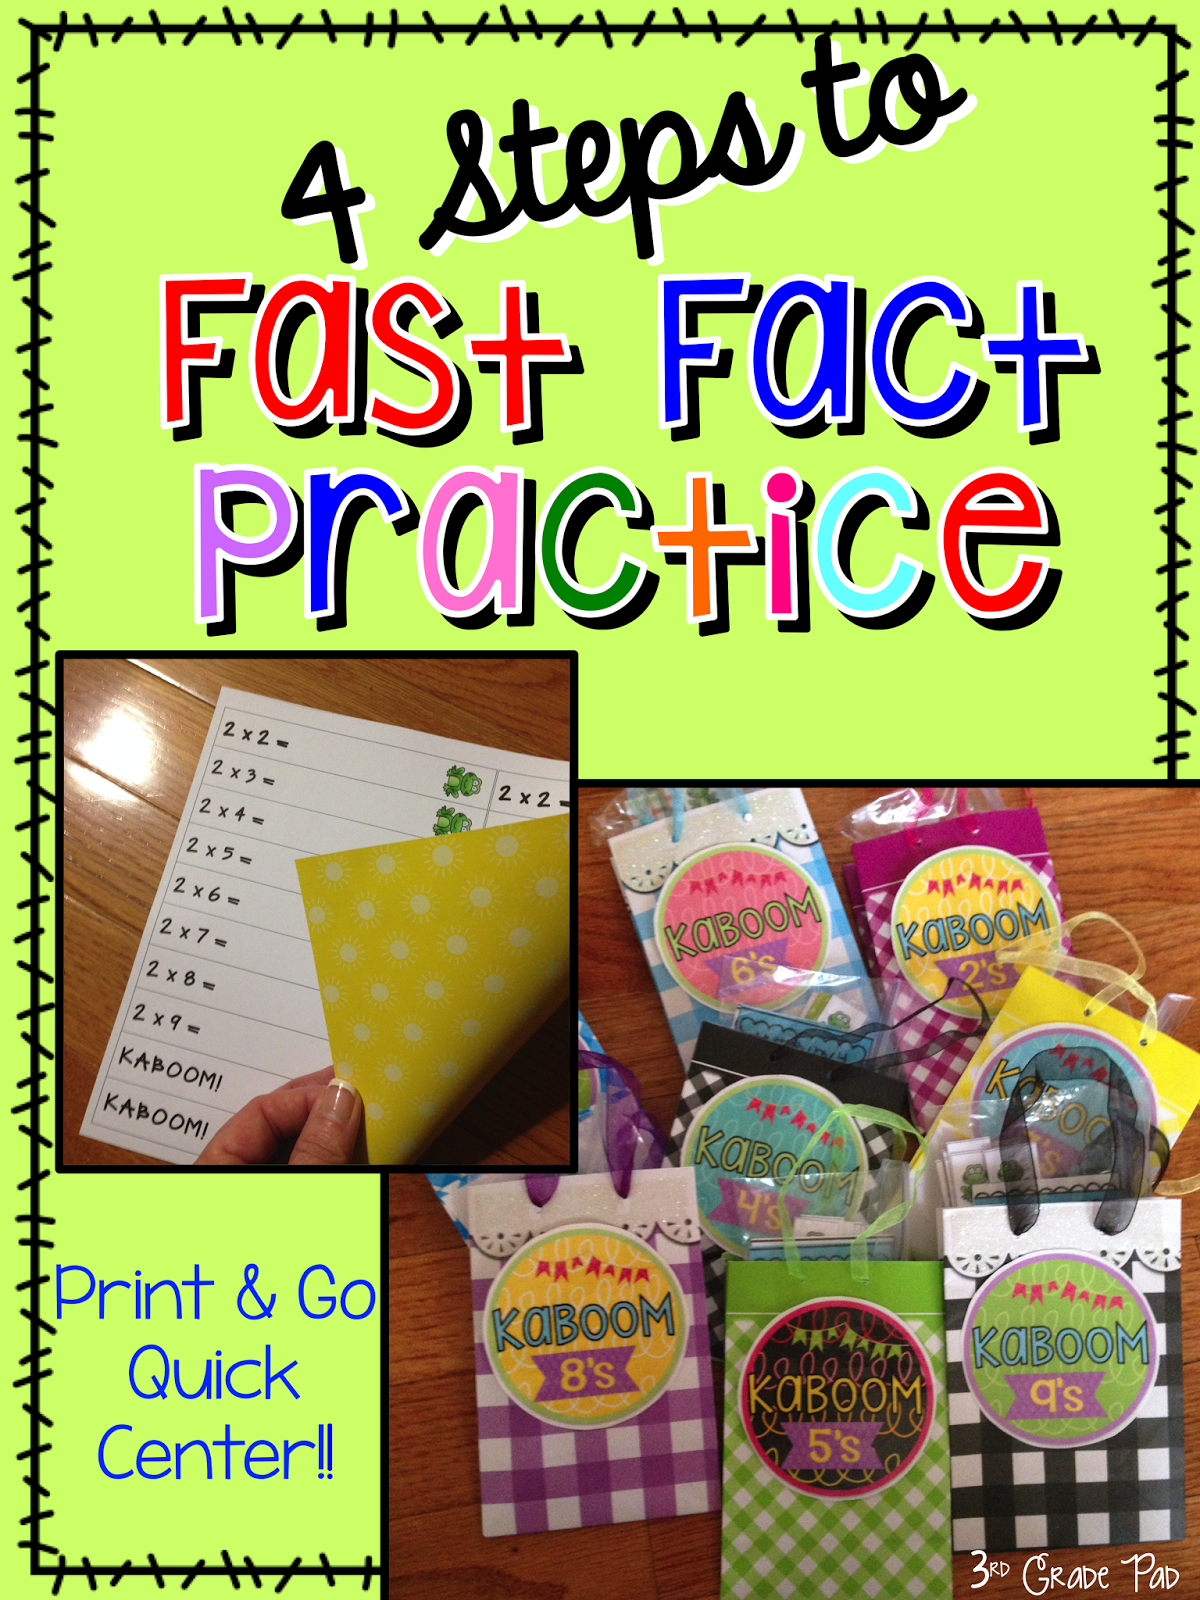 Multiplication Fluency Game: Kaboom! - 3rd Grade Pad